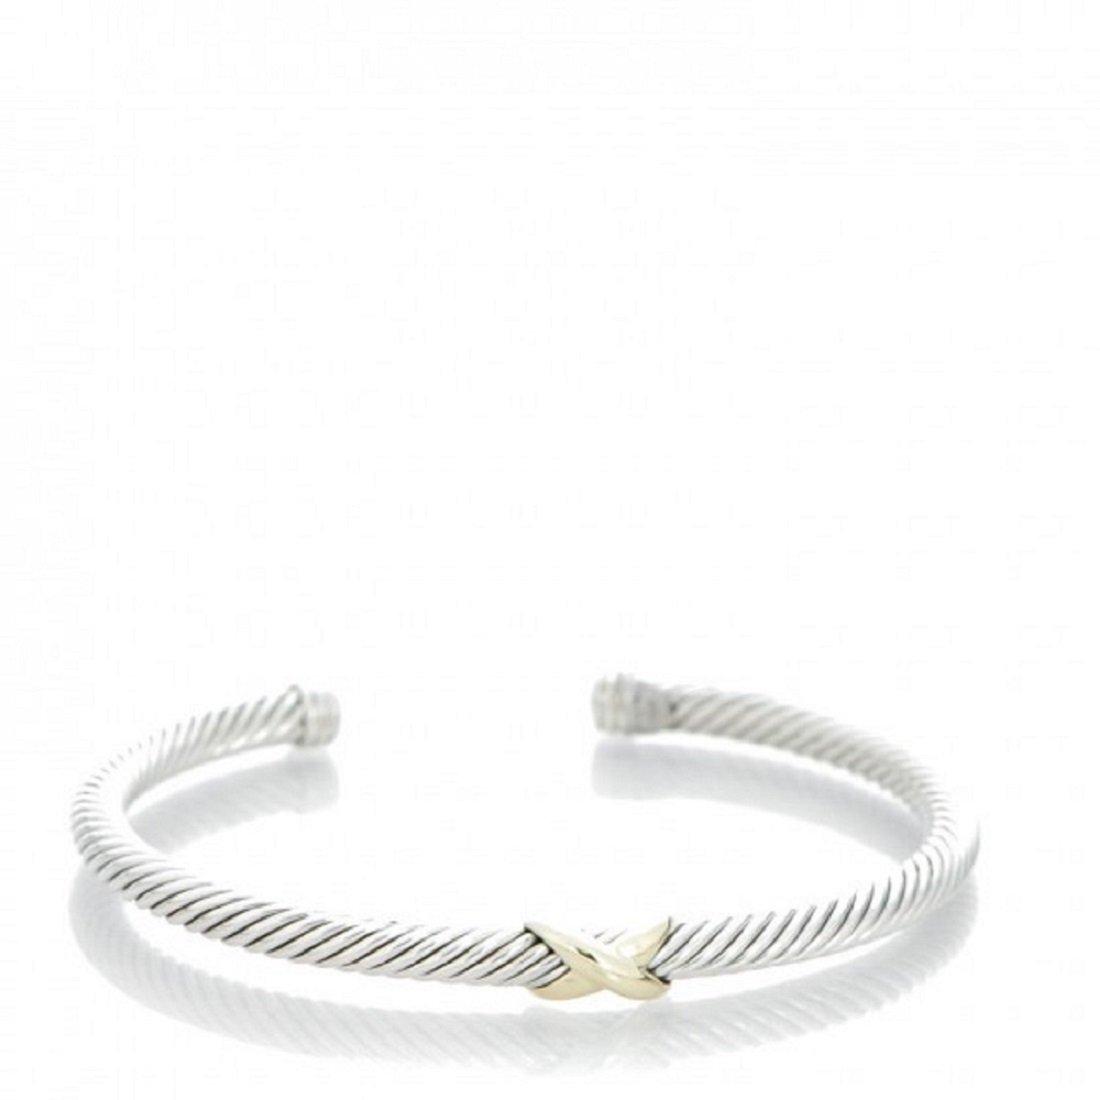 David Yurman Women's X-Station Cable Bracelet Medium Silver & Gold by David Yurman